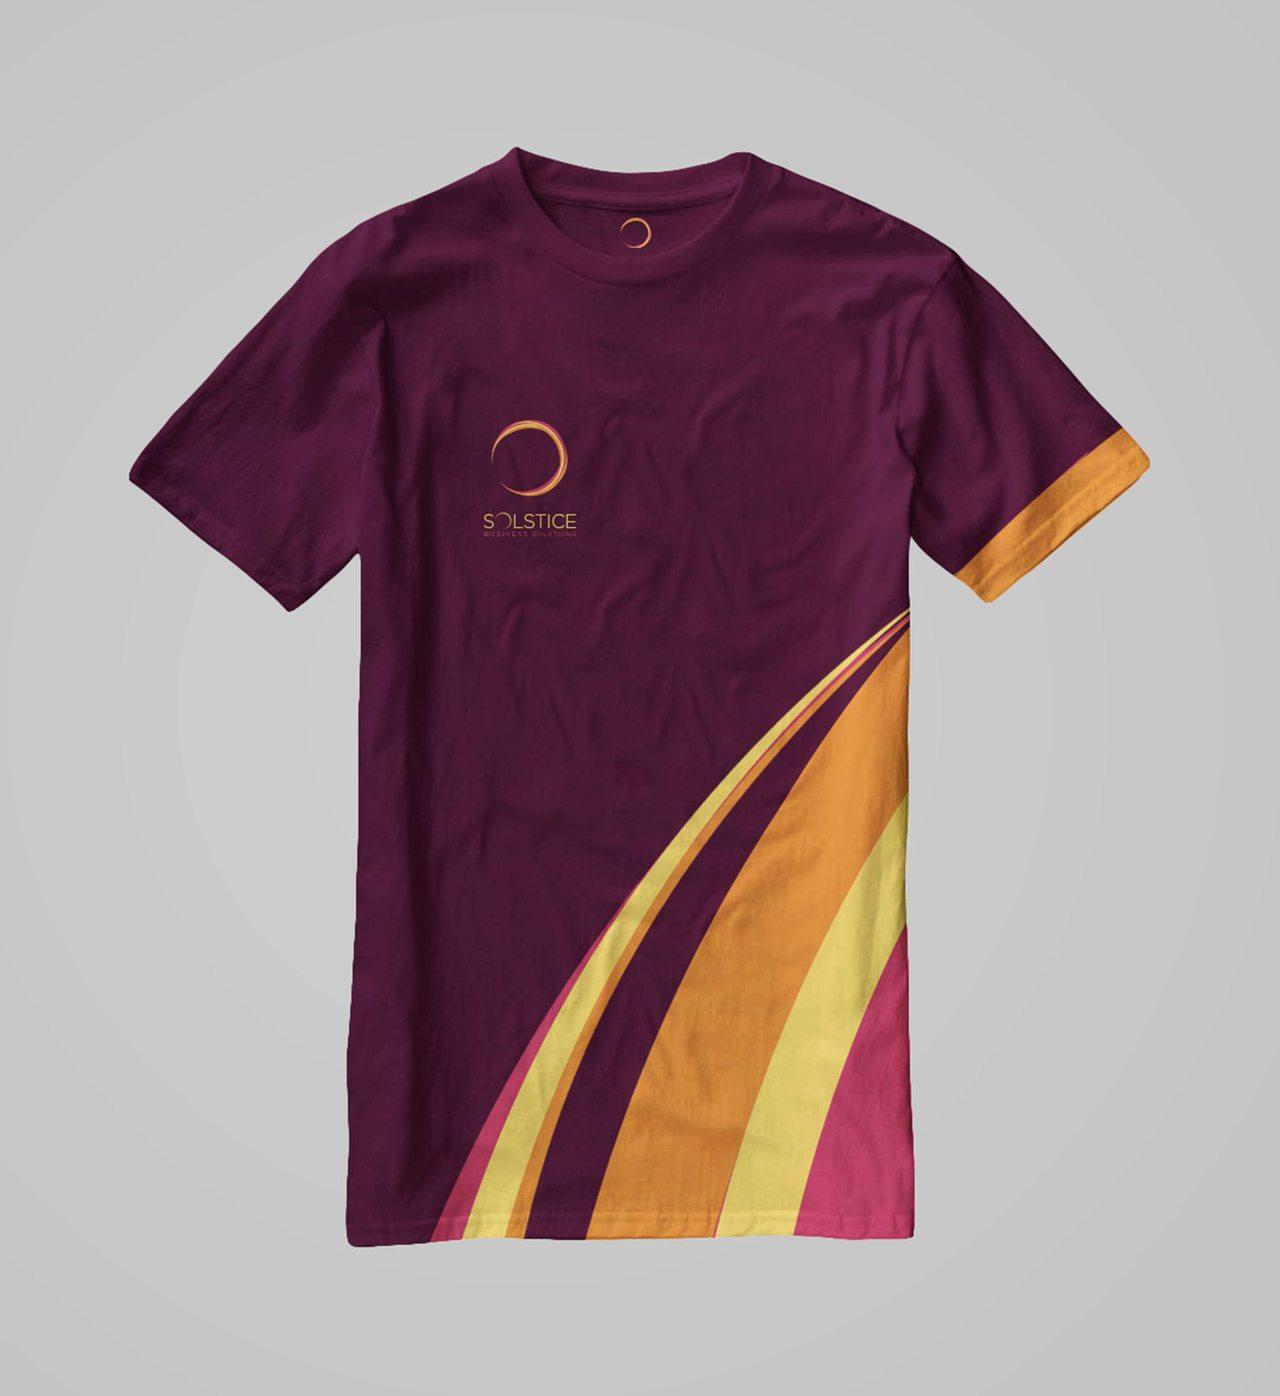 Solstice Calgary Tshirt Design